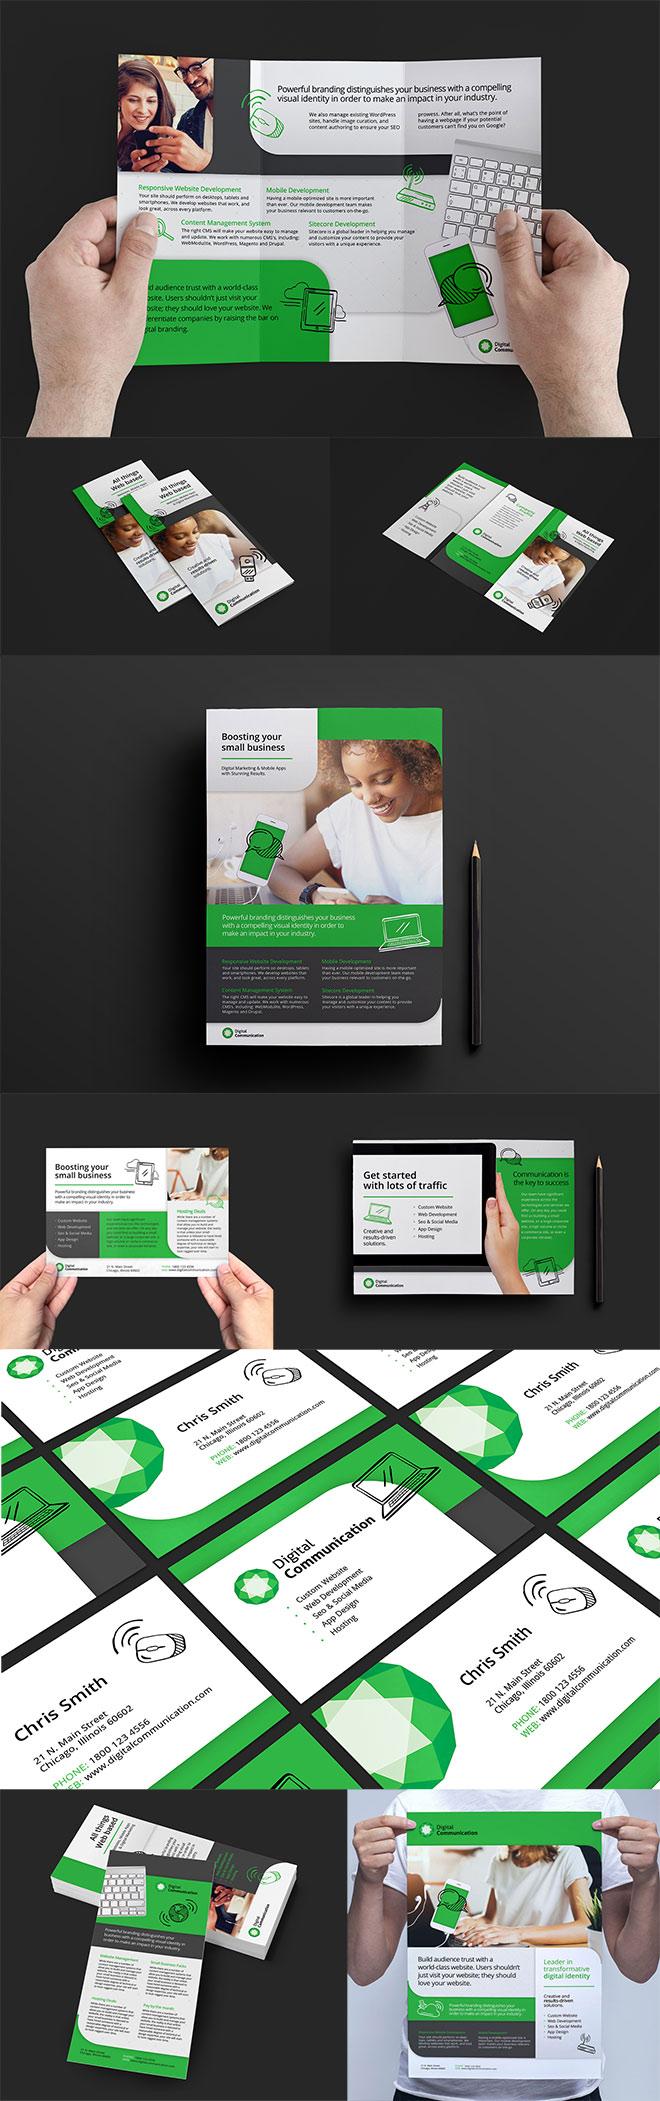 BrandPacks Web Design Series